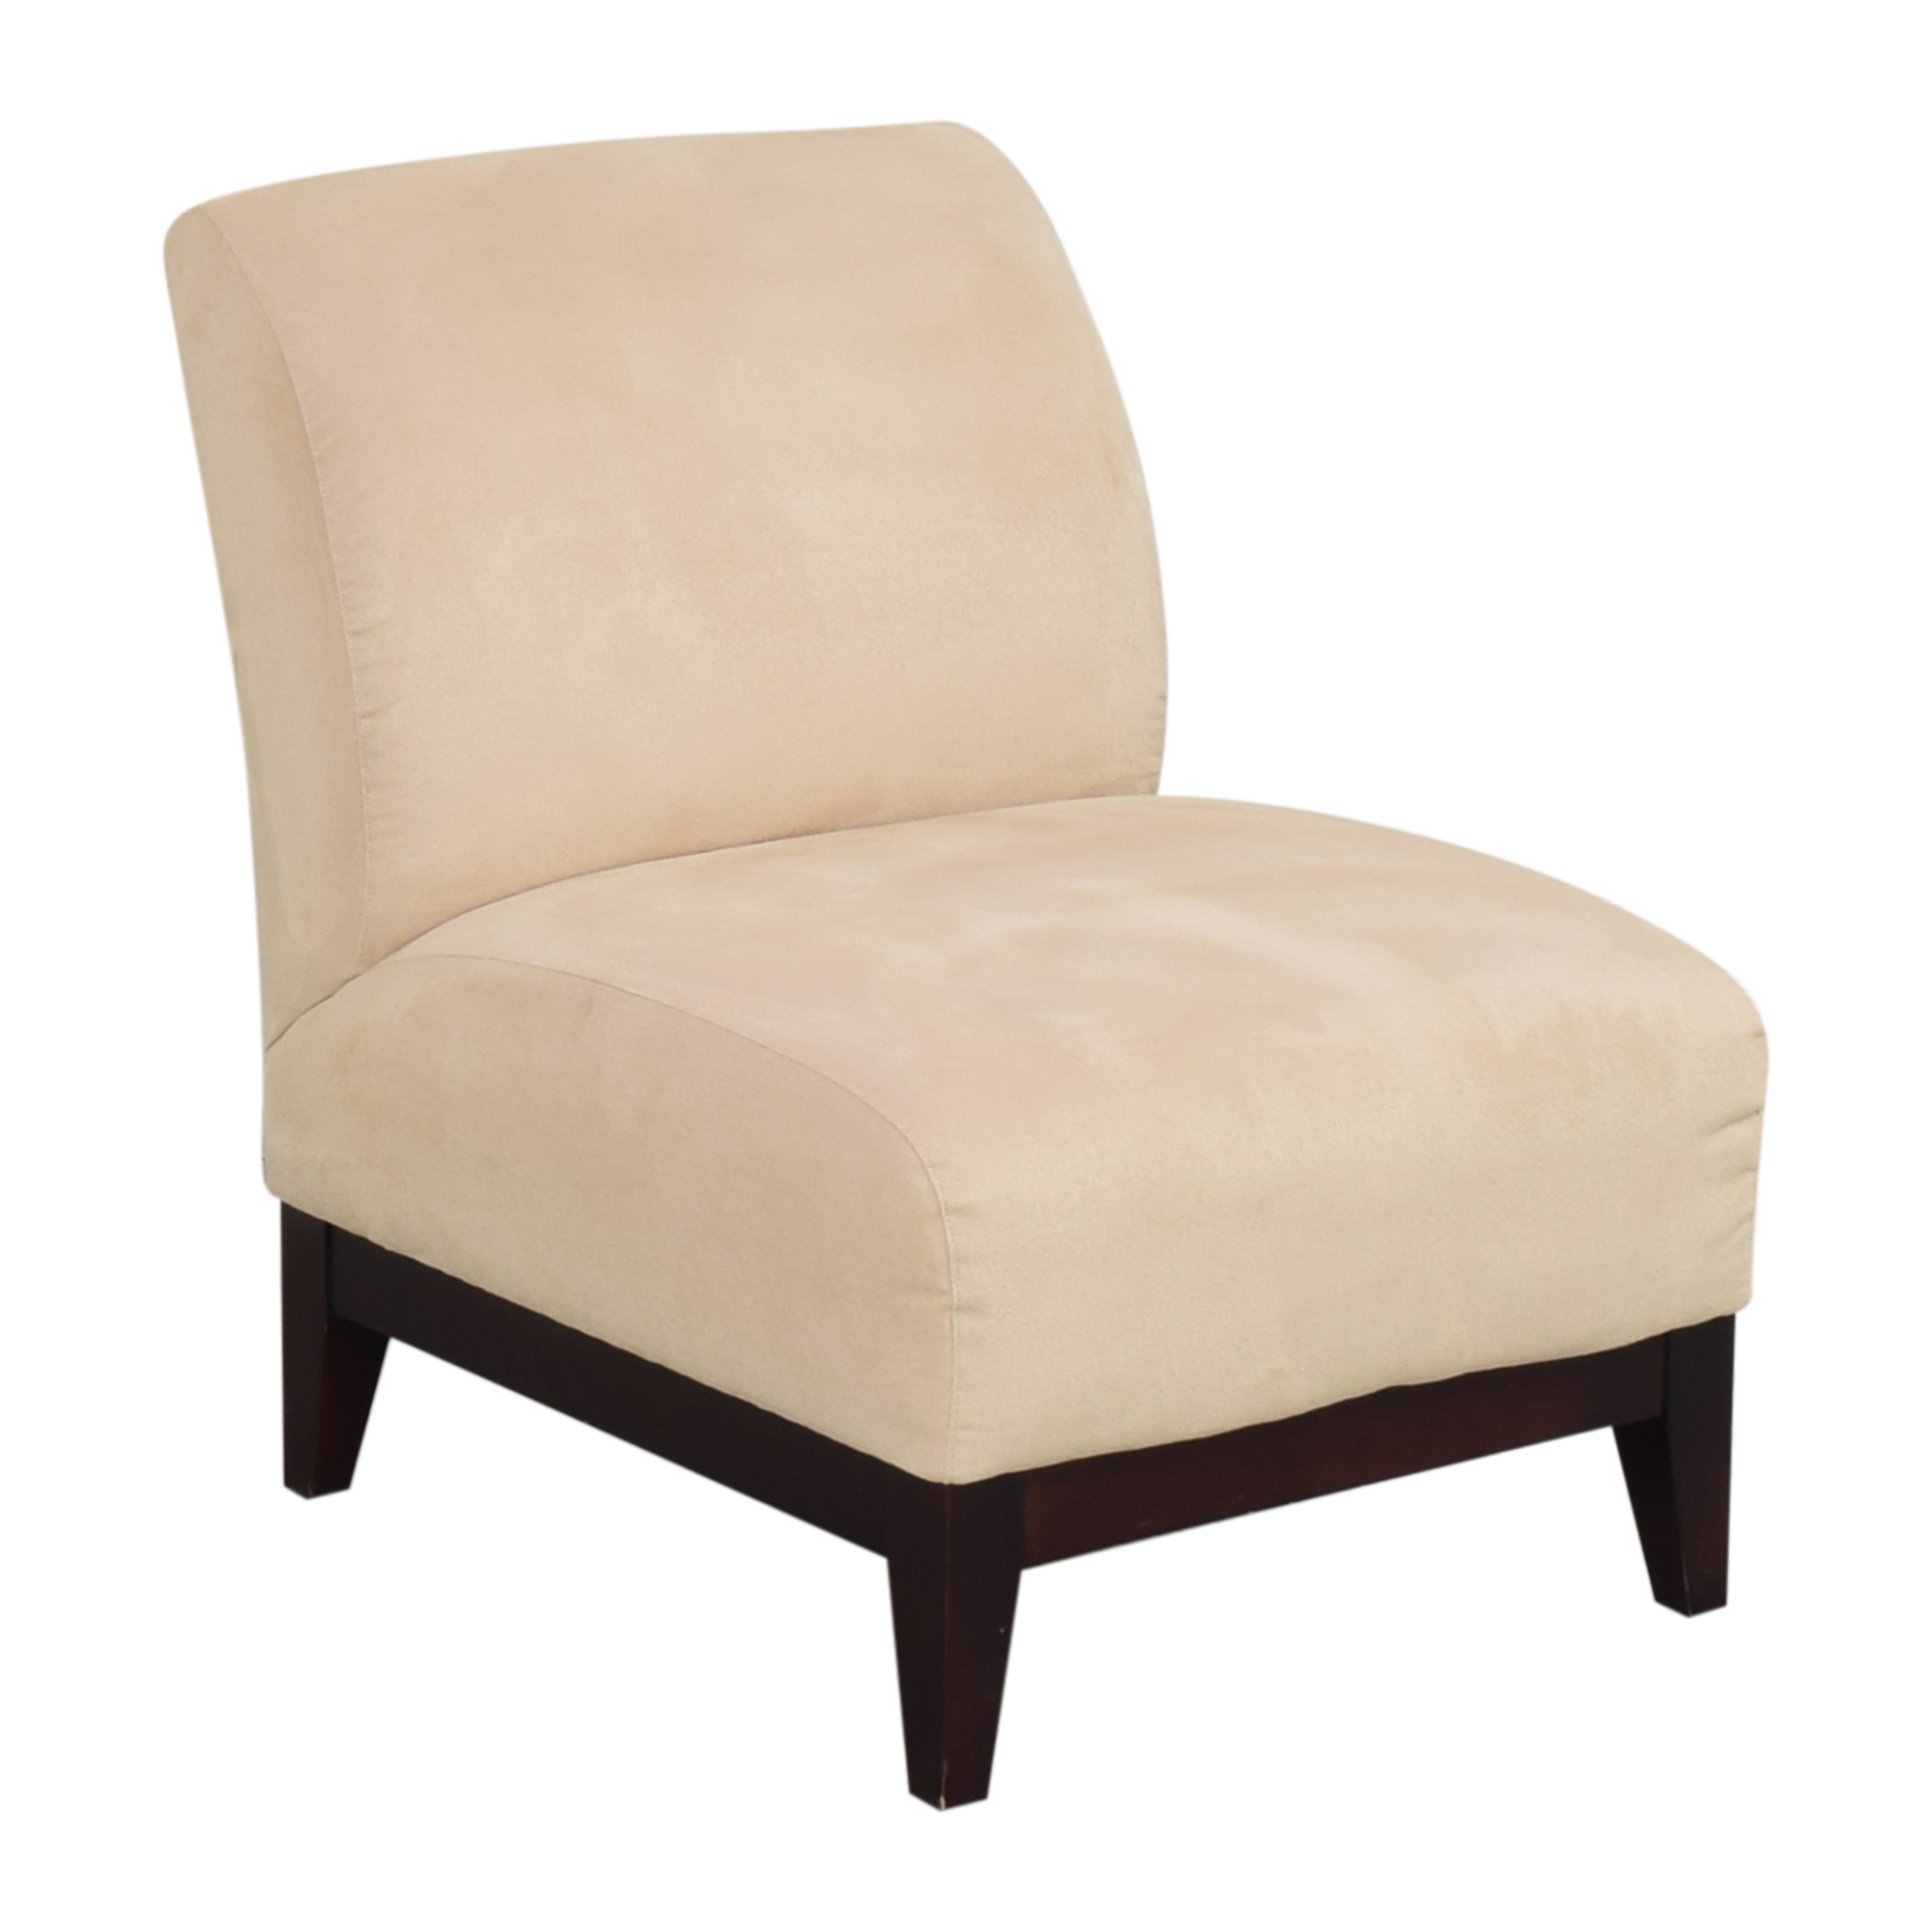 Mitchell Gold + Bob Williams Mitchell Gold + Bob Williams Slipper Chair used